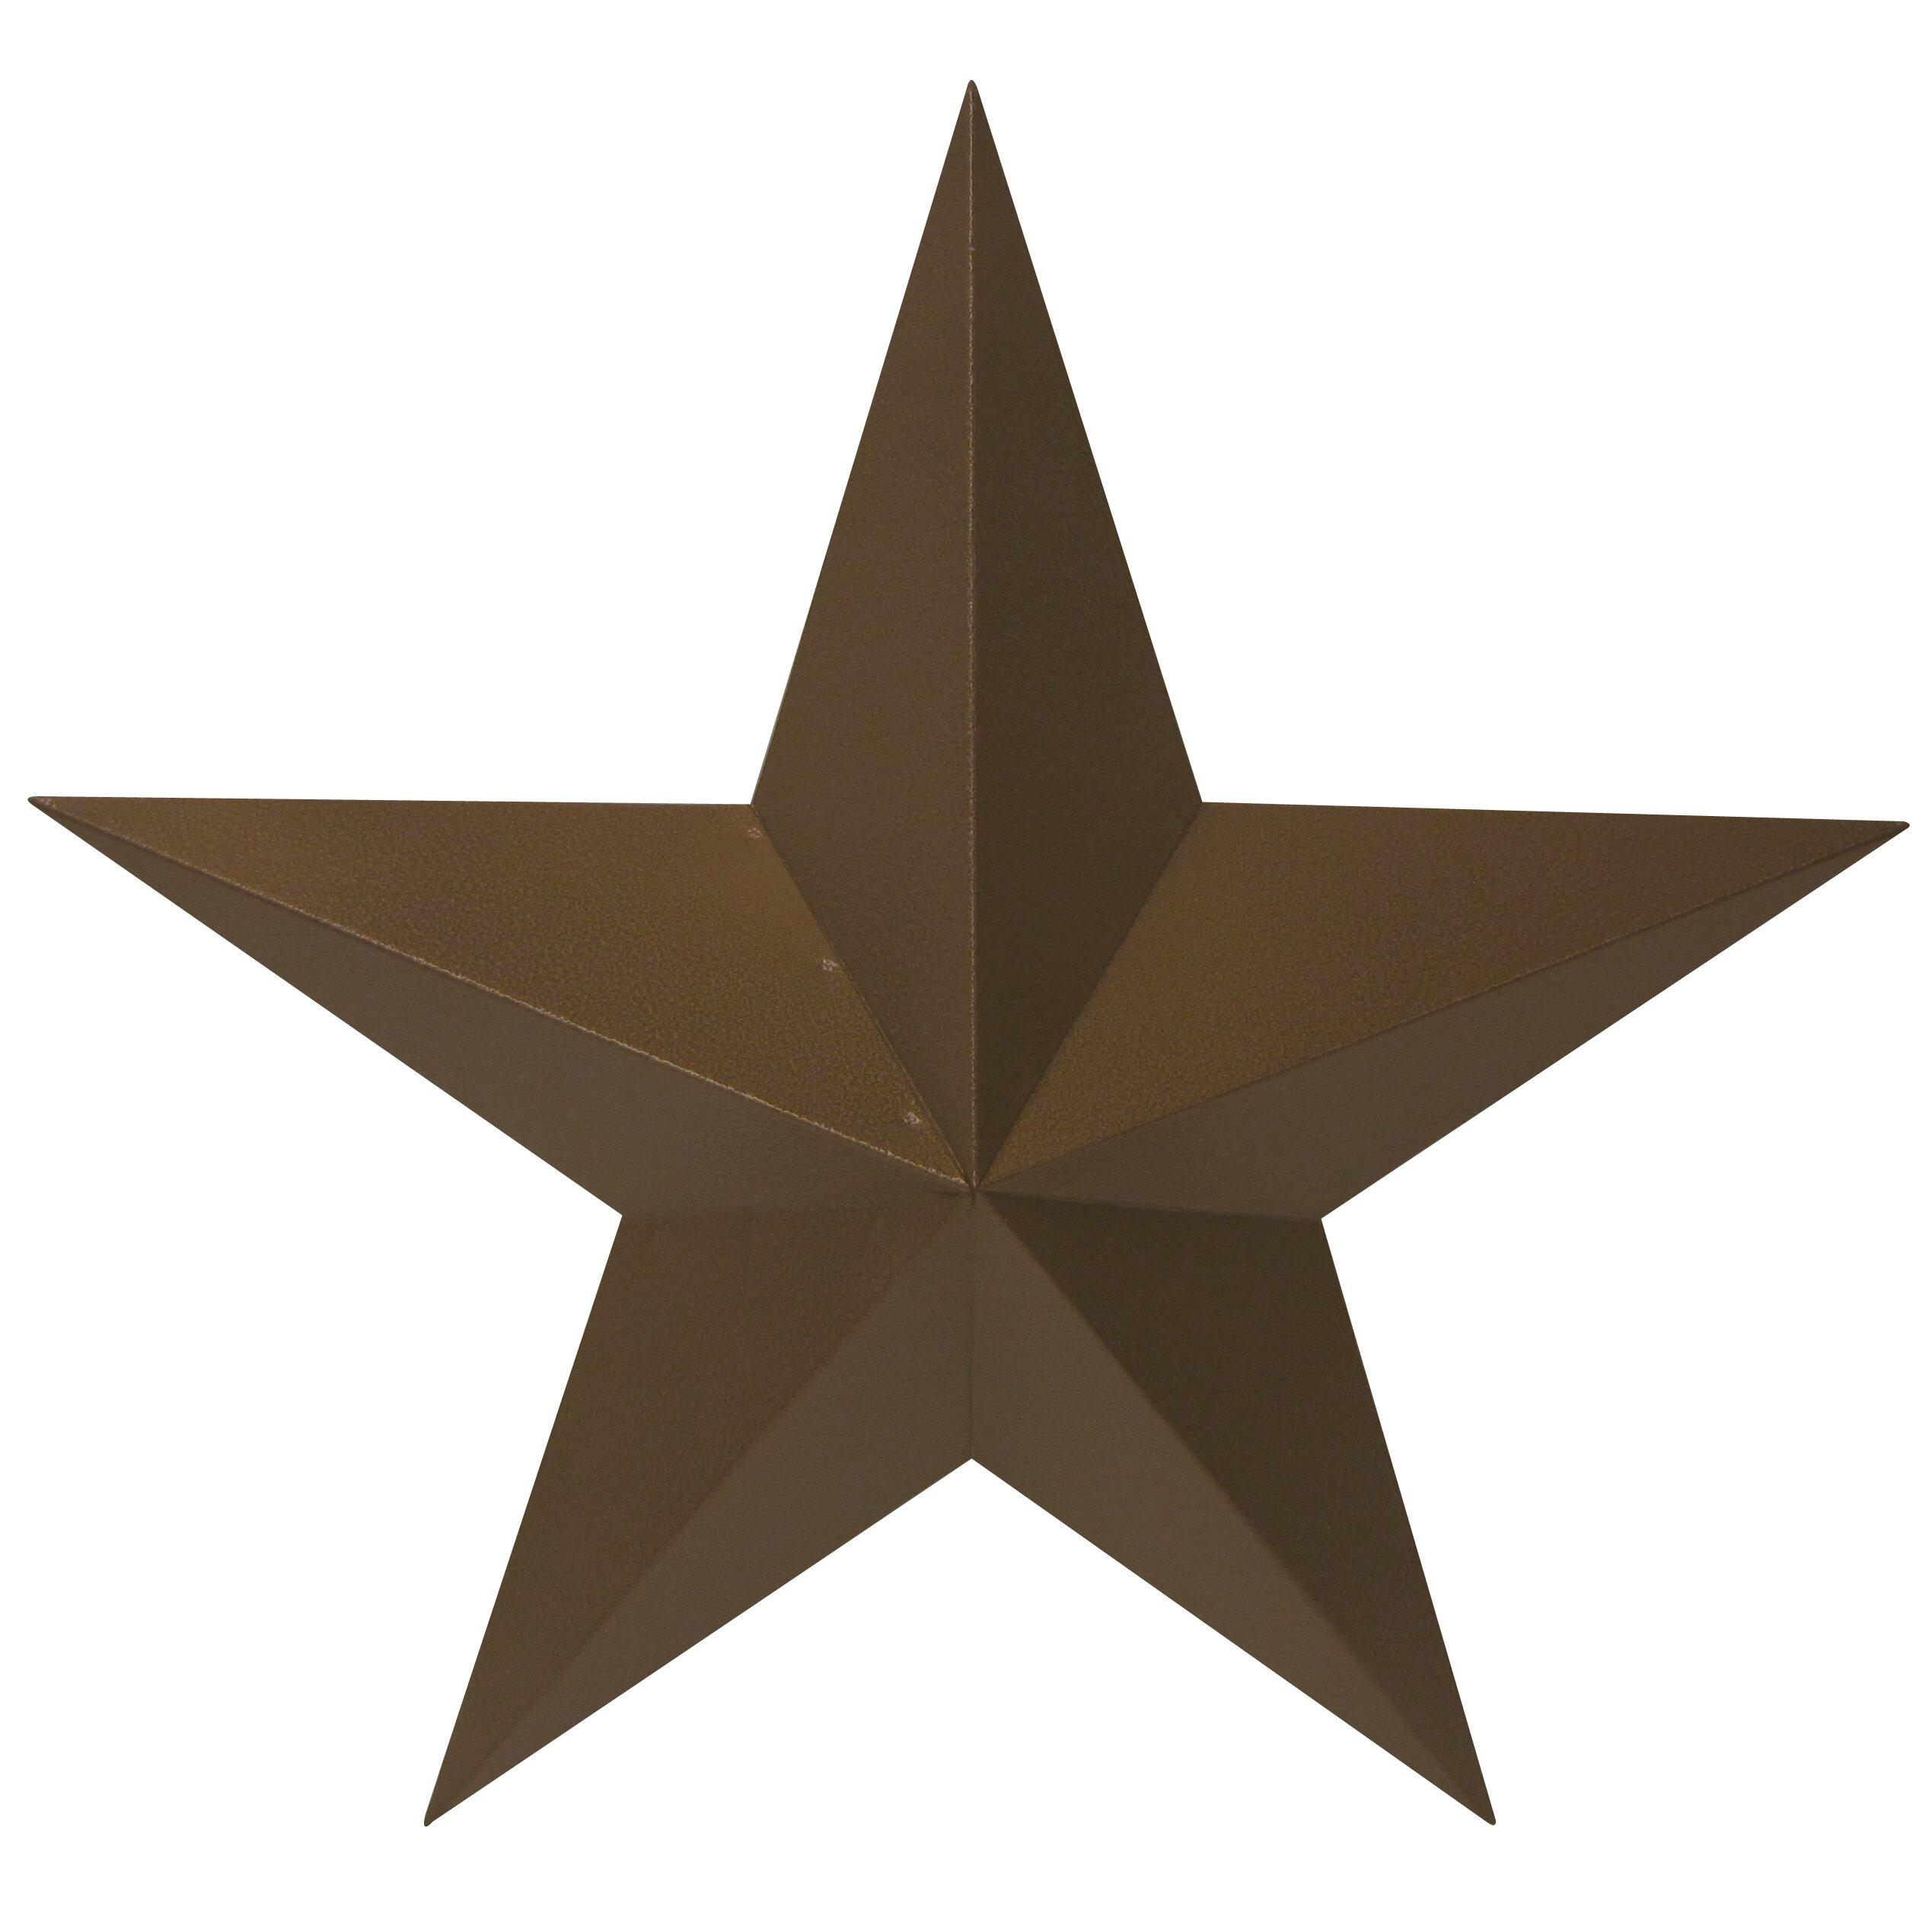 Glass Star Wall Decor : Leighcountry star wall d?cor reviews wayfair